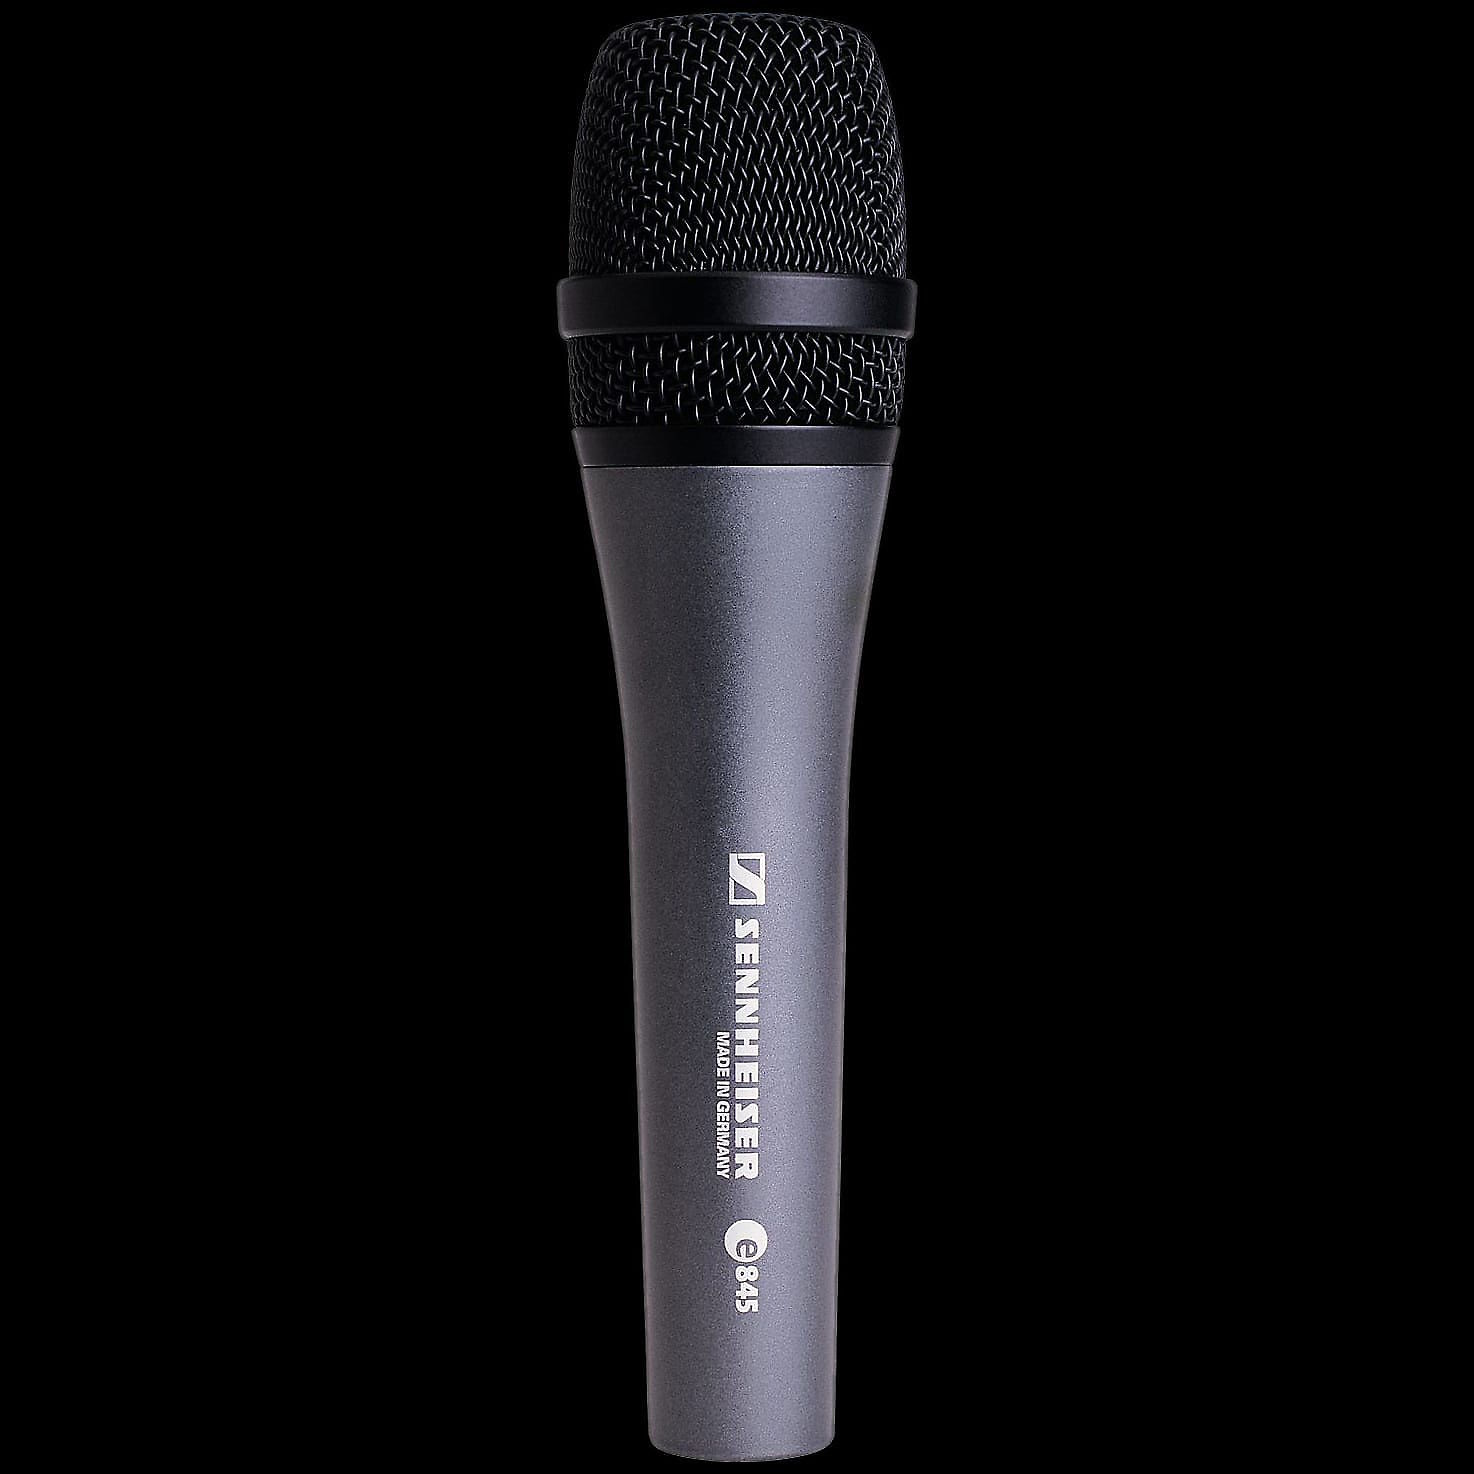 *BRAND NEW* Sennheiser e845 Supercardioid Dynamic Vocal Mic